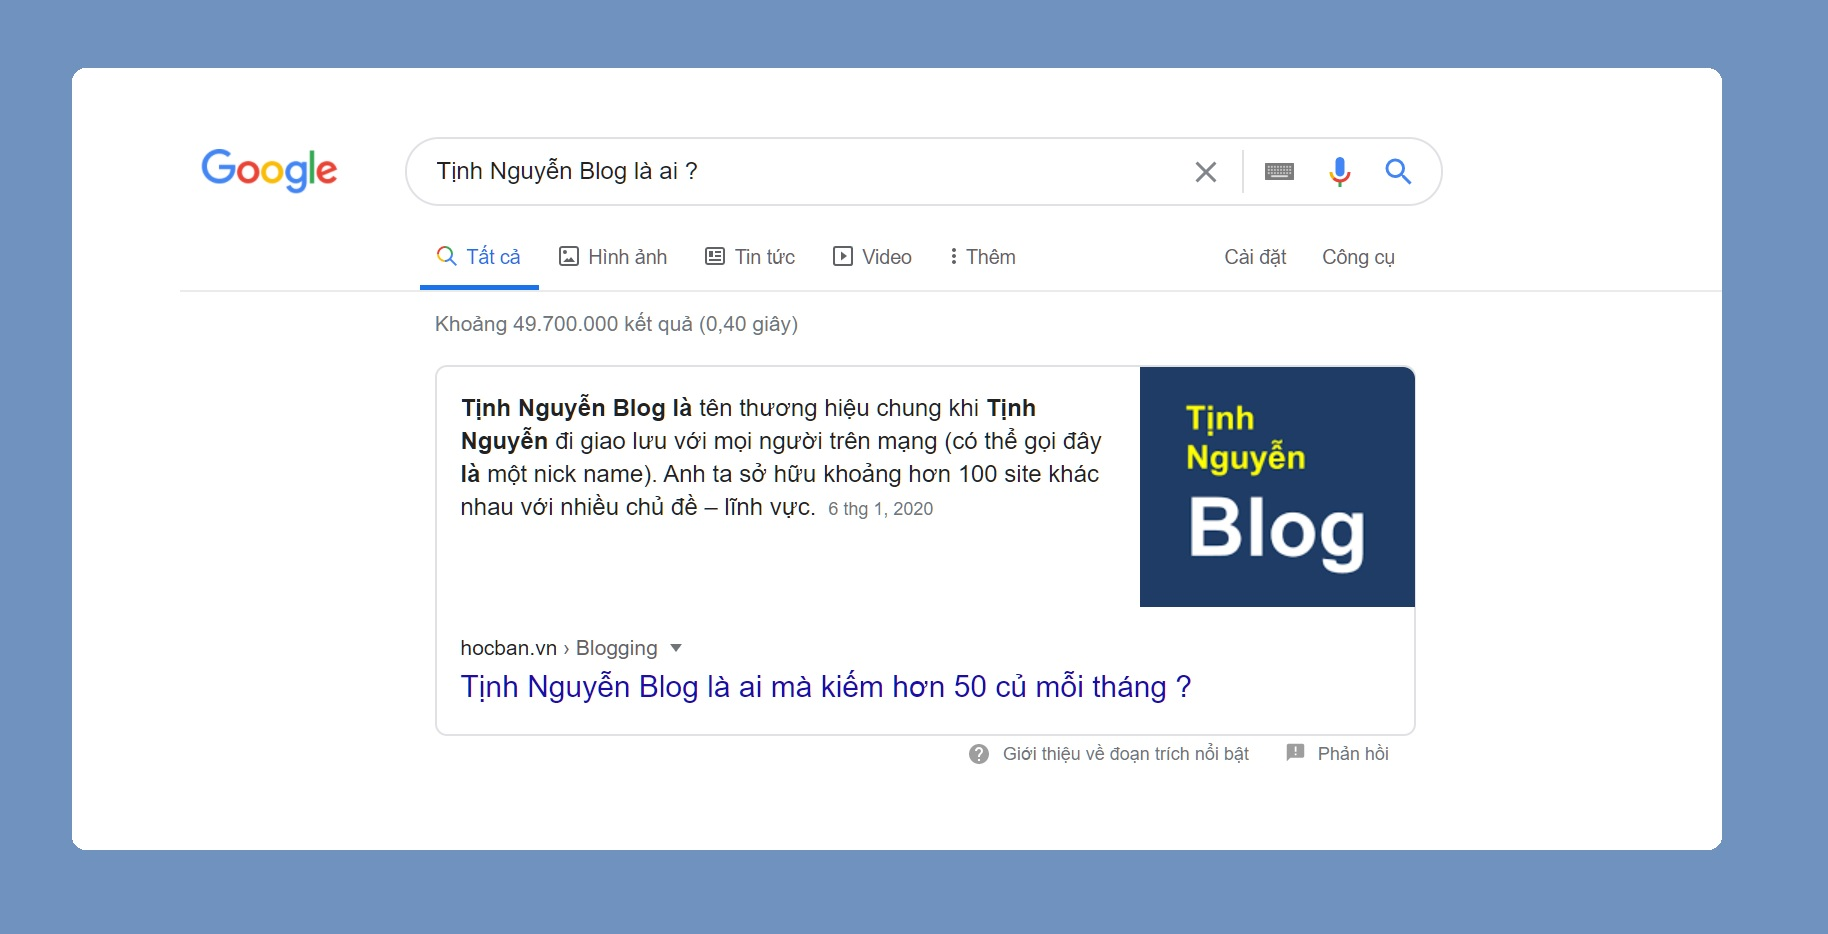 tinh nguyen blog la ai vay.jpg